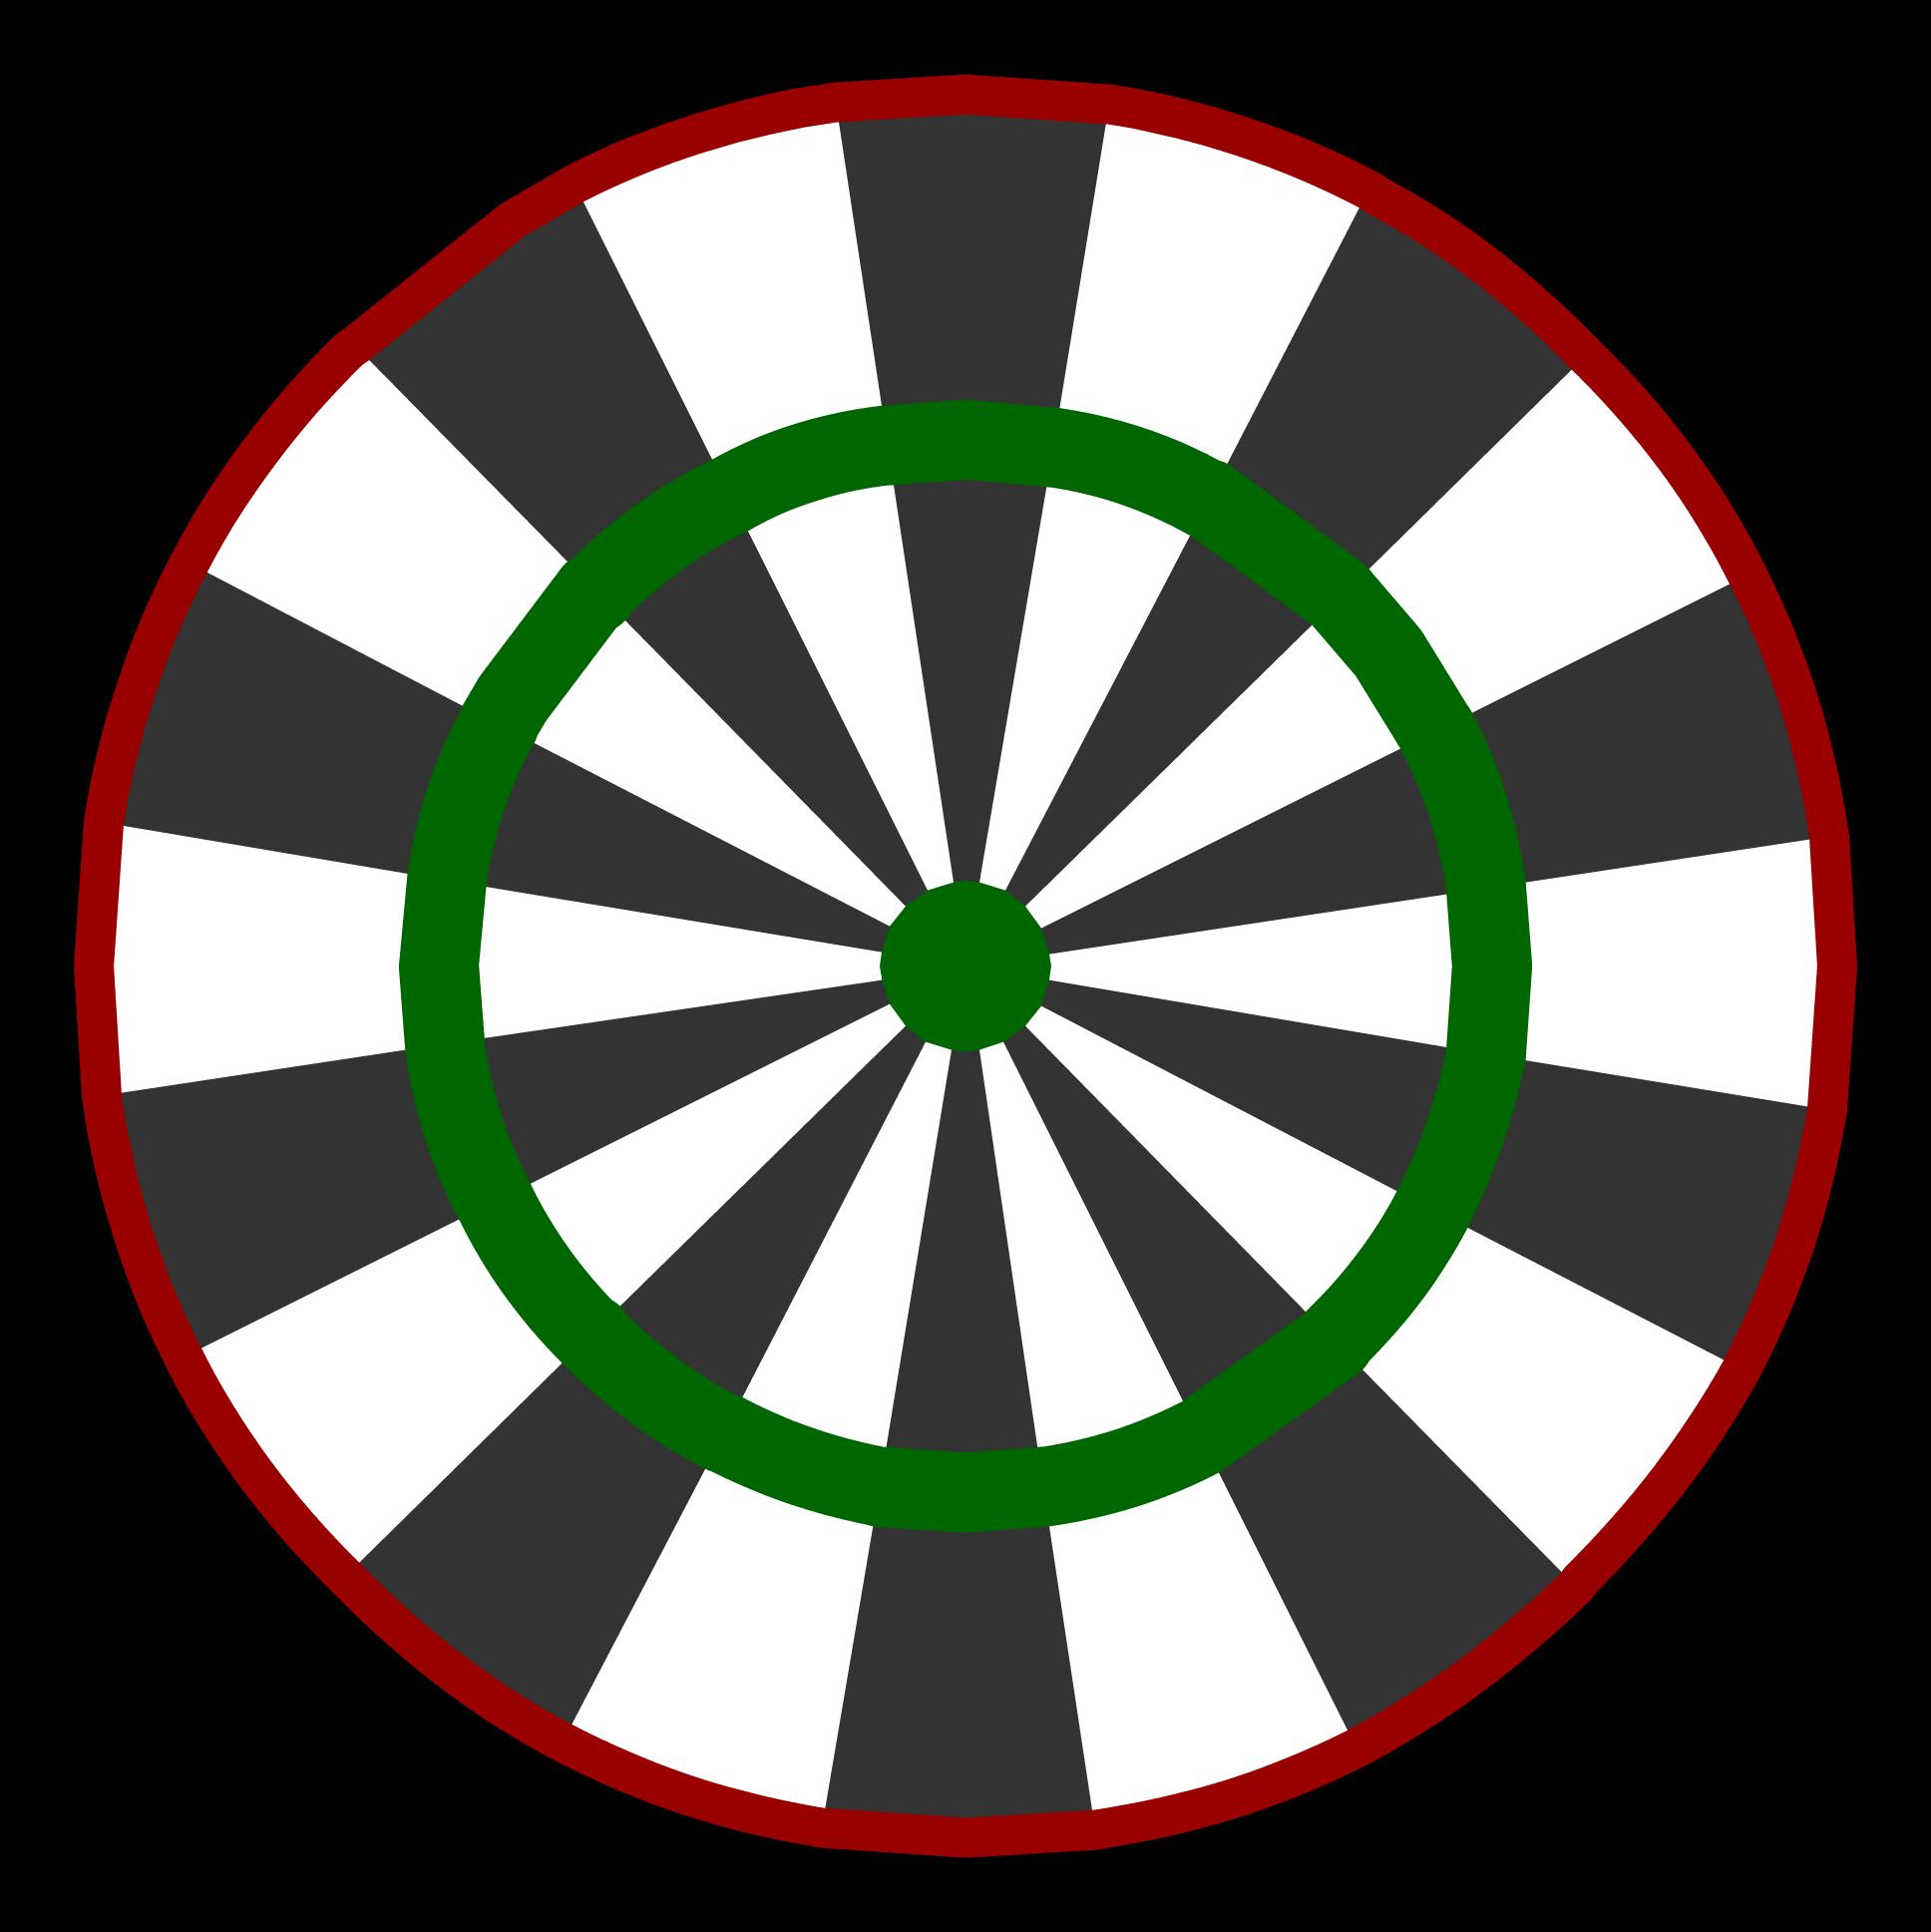 Dart Board Club Penguin Wiki Fandom Powered By Wikia